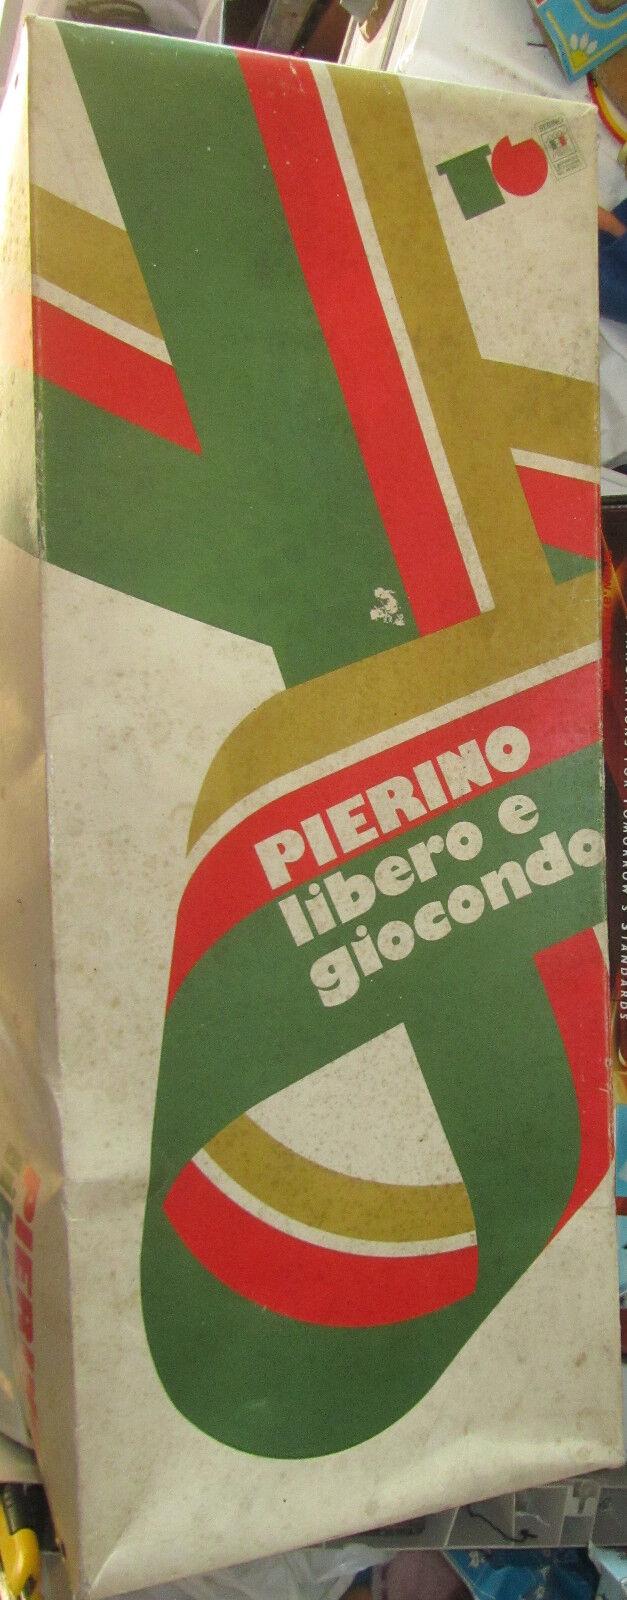 Pierino Libero e Giocondo con scatola scatola scatola Bambolotto ciccio bello SPESE GRATIS bcacc5